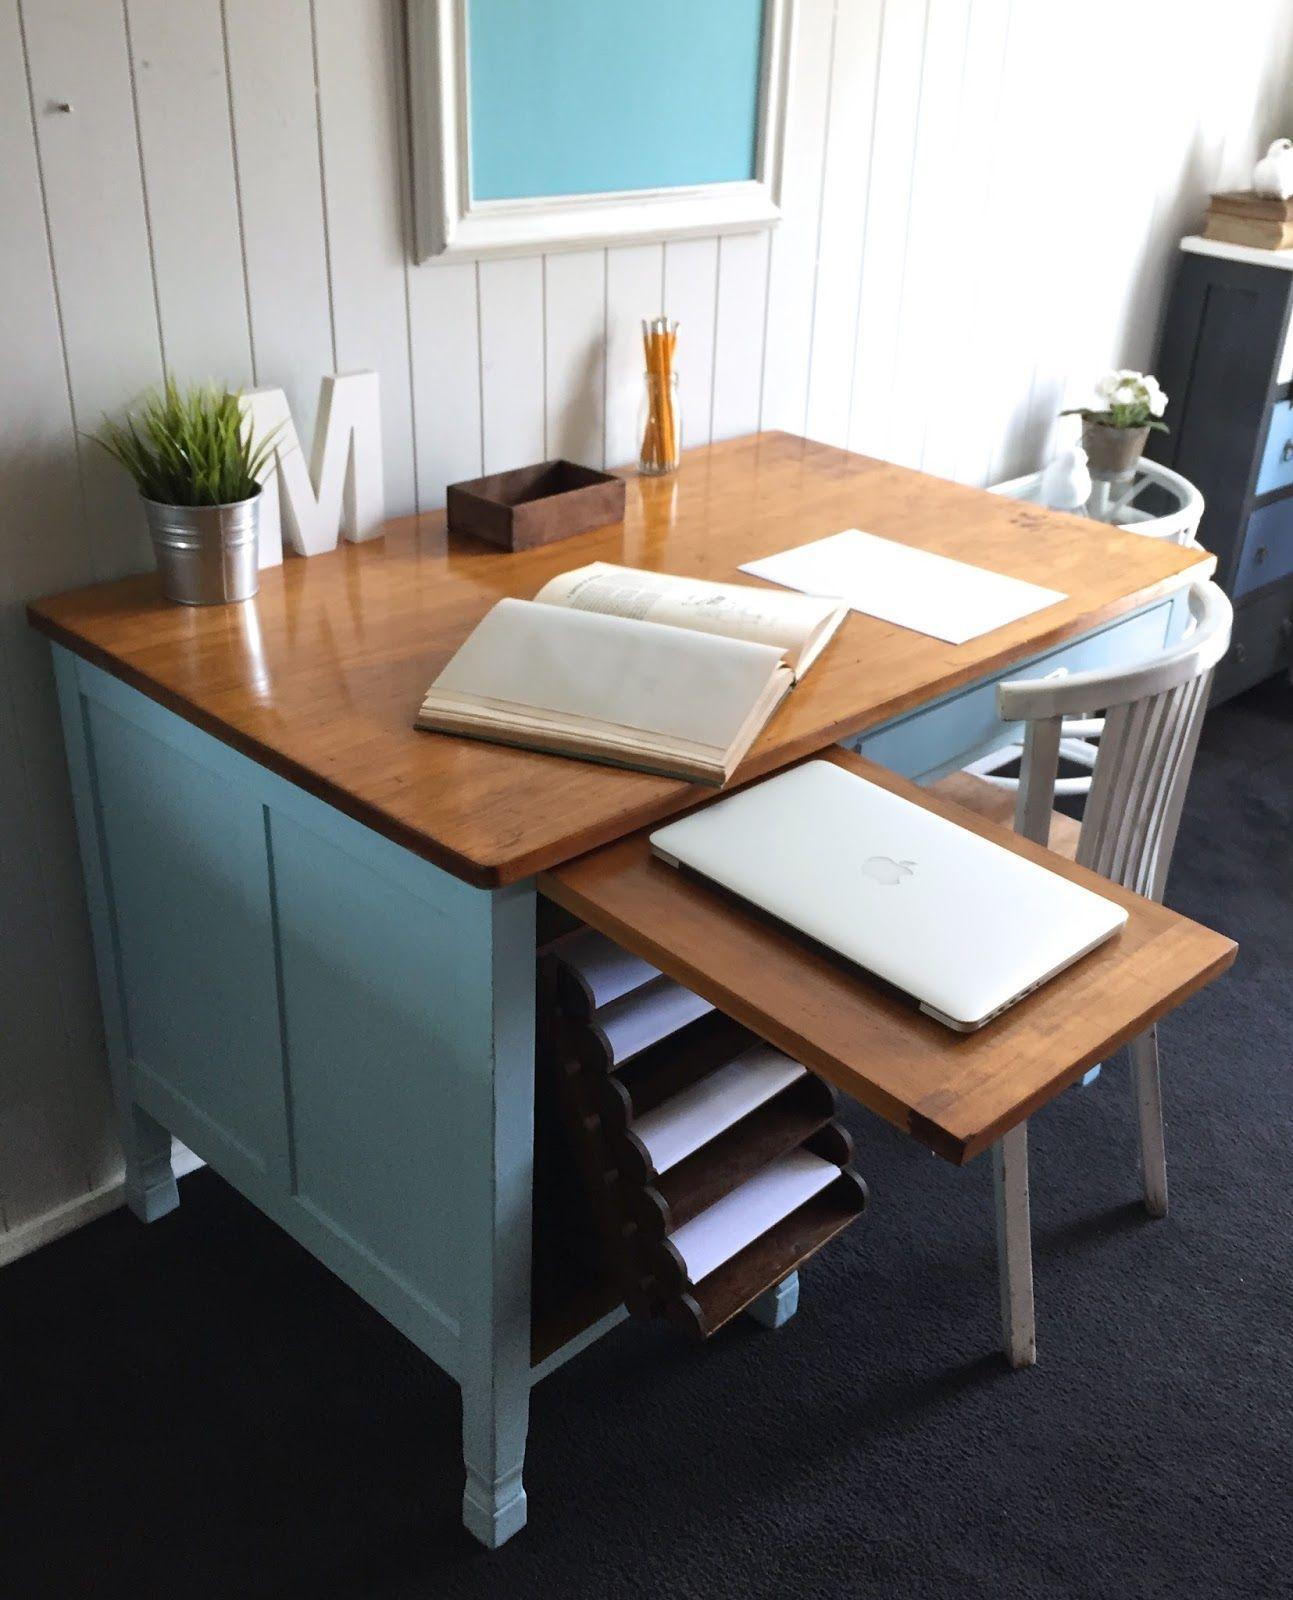 Furniture Portfolio Furniture, Industrial style desk